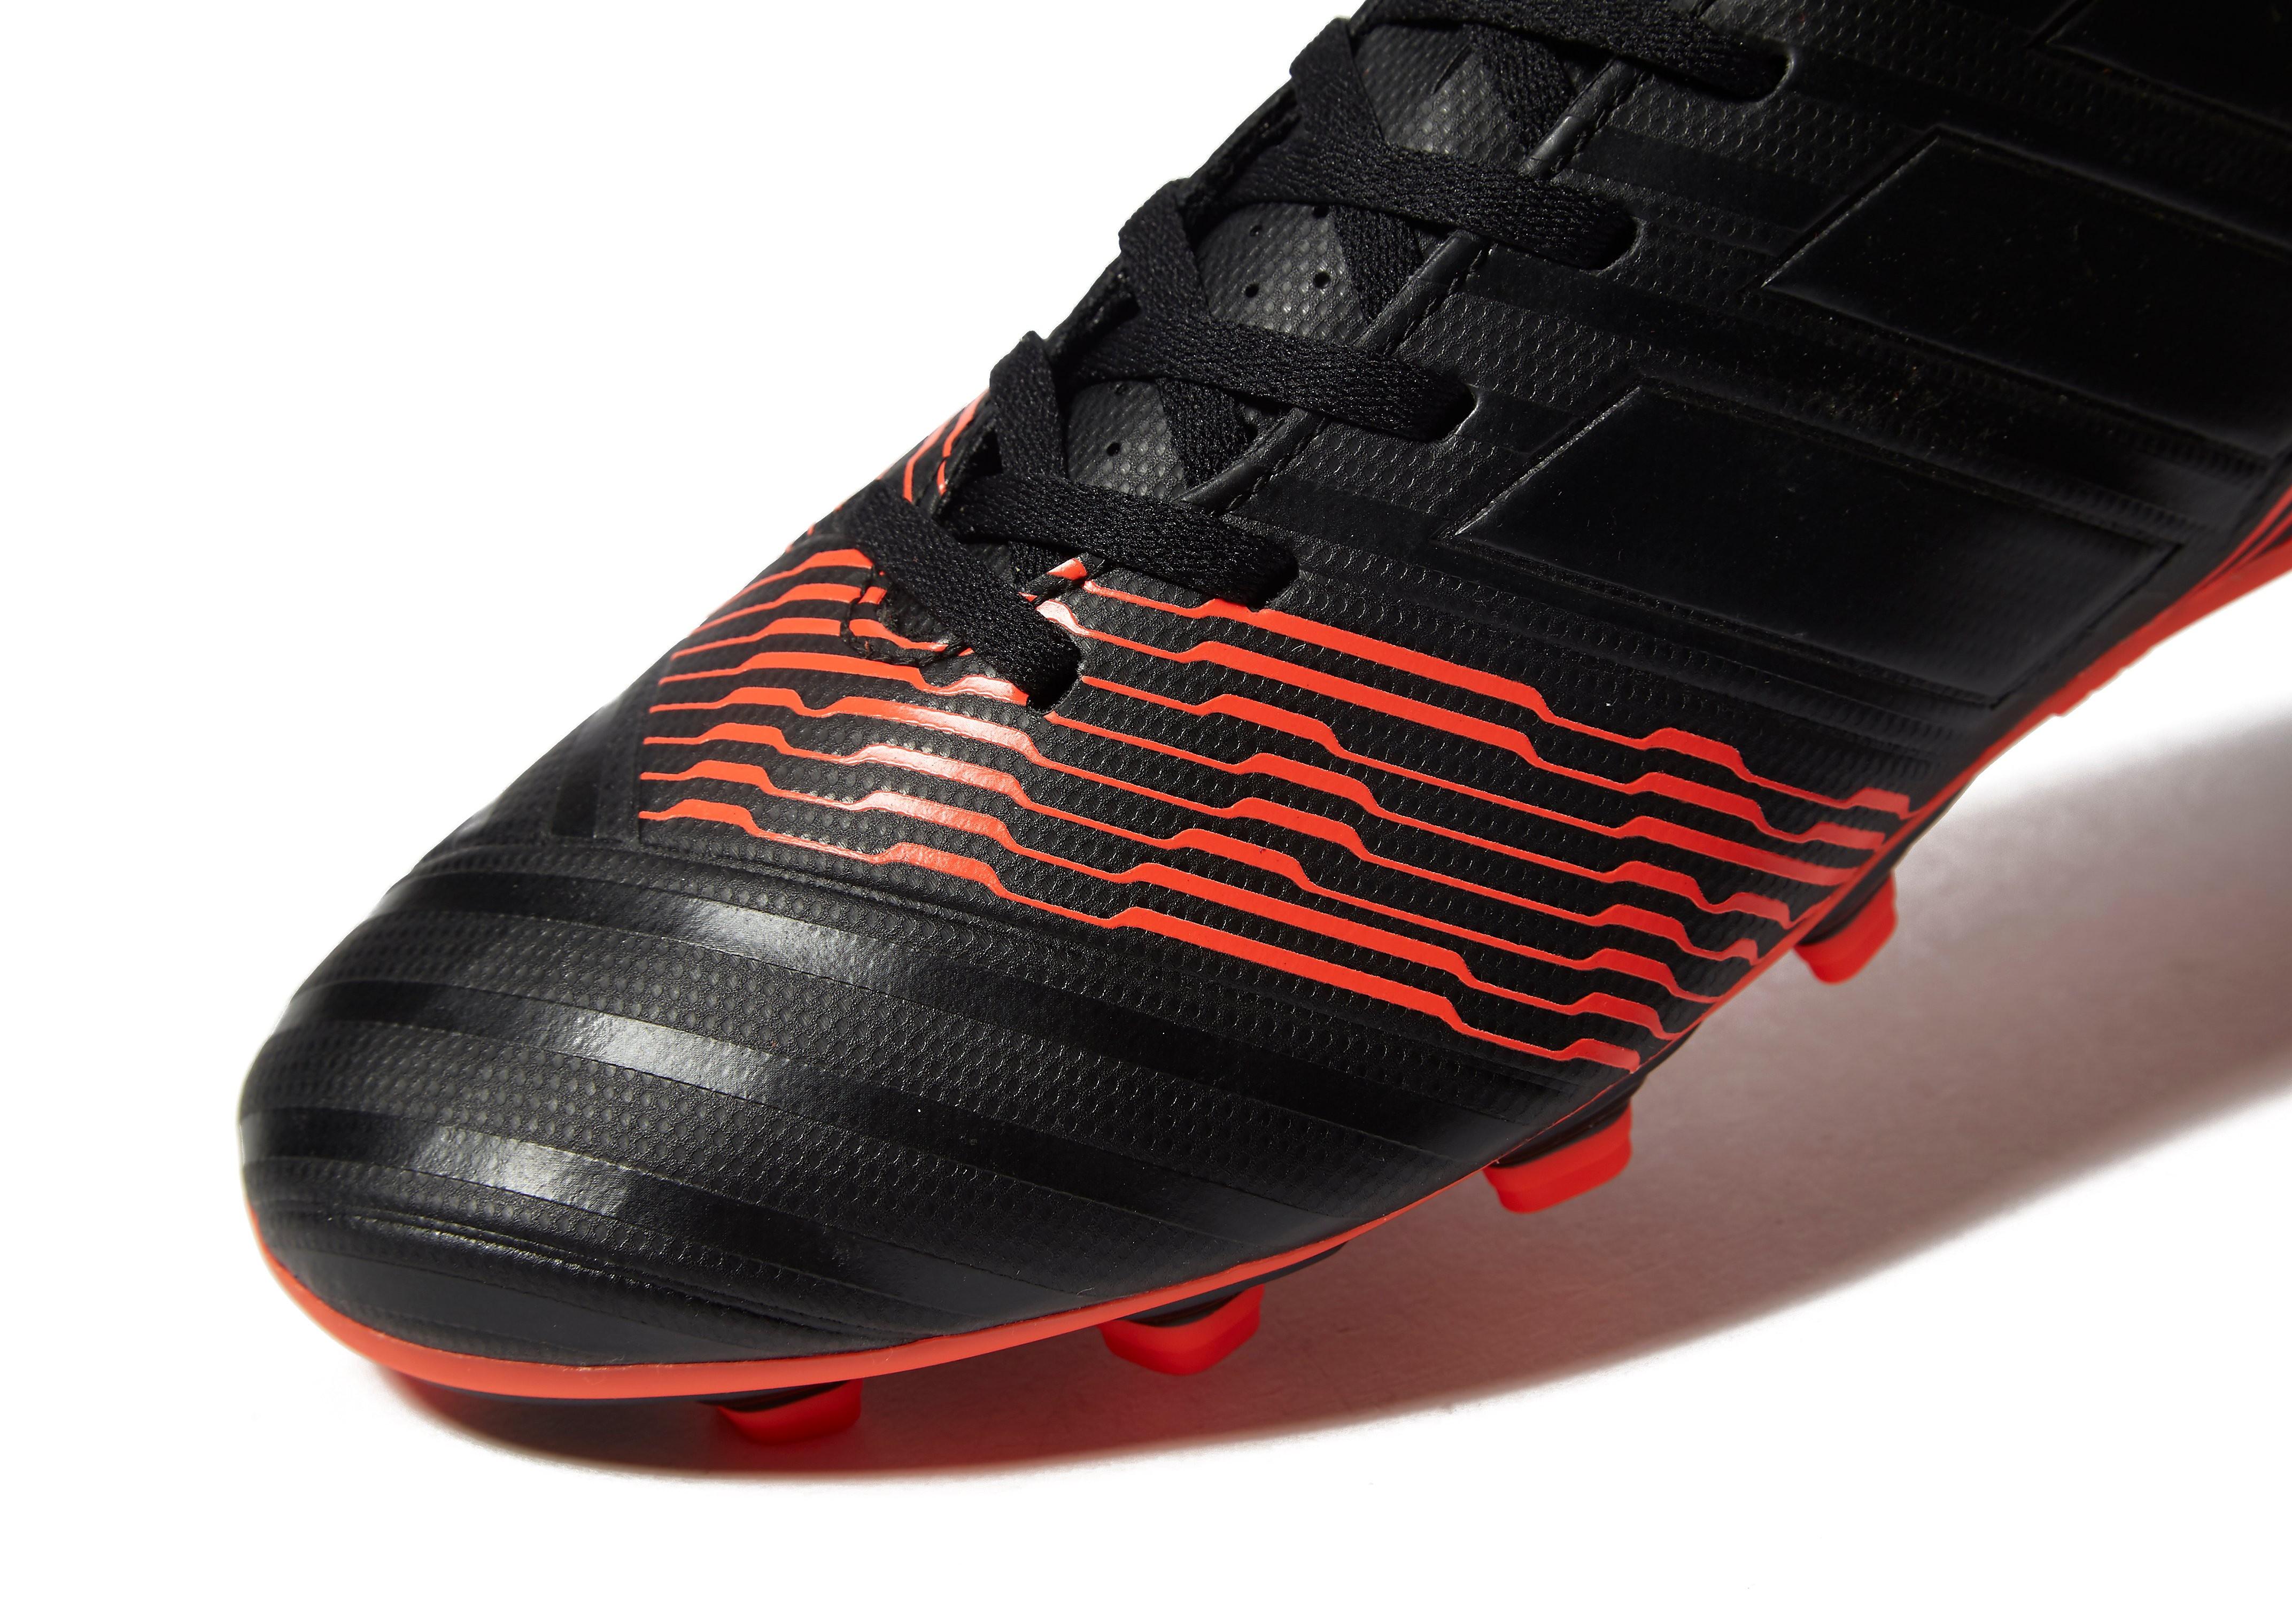 adidas SkyStalker Nemeziz 17.4 FG